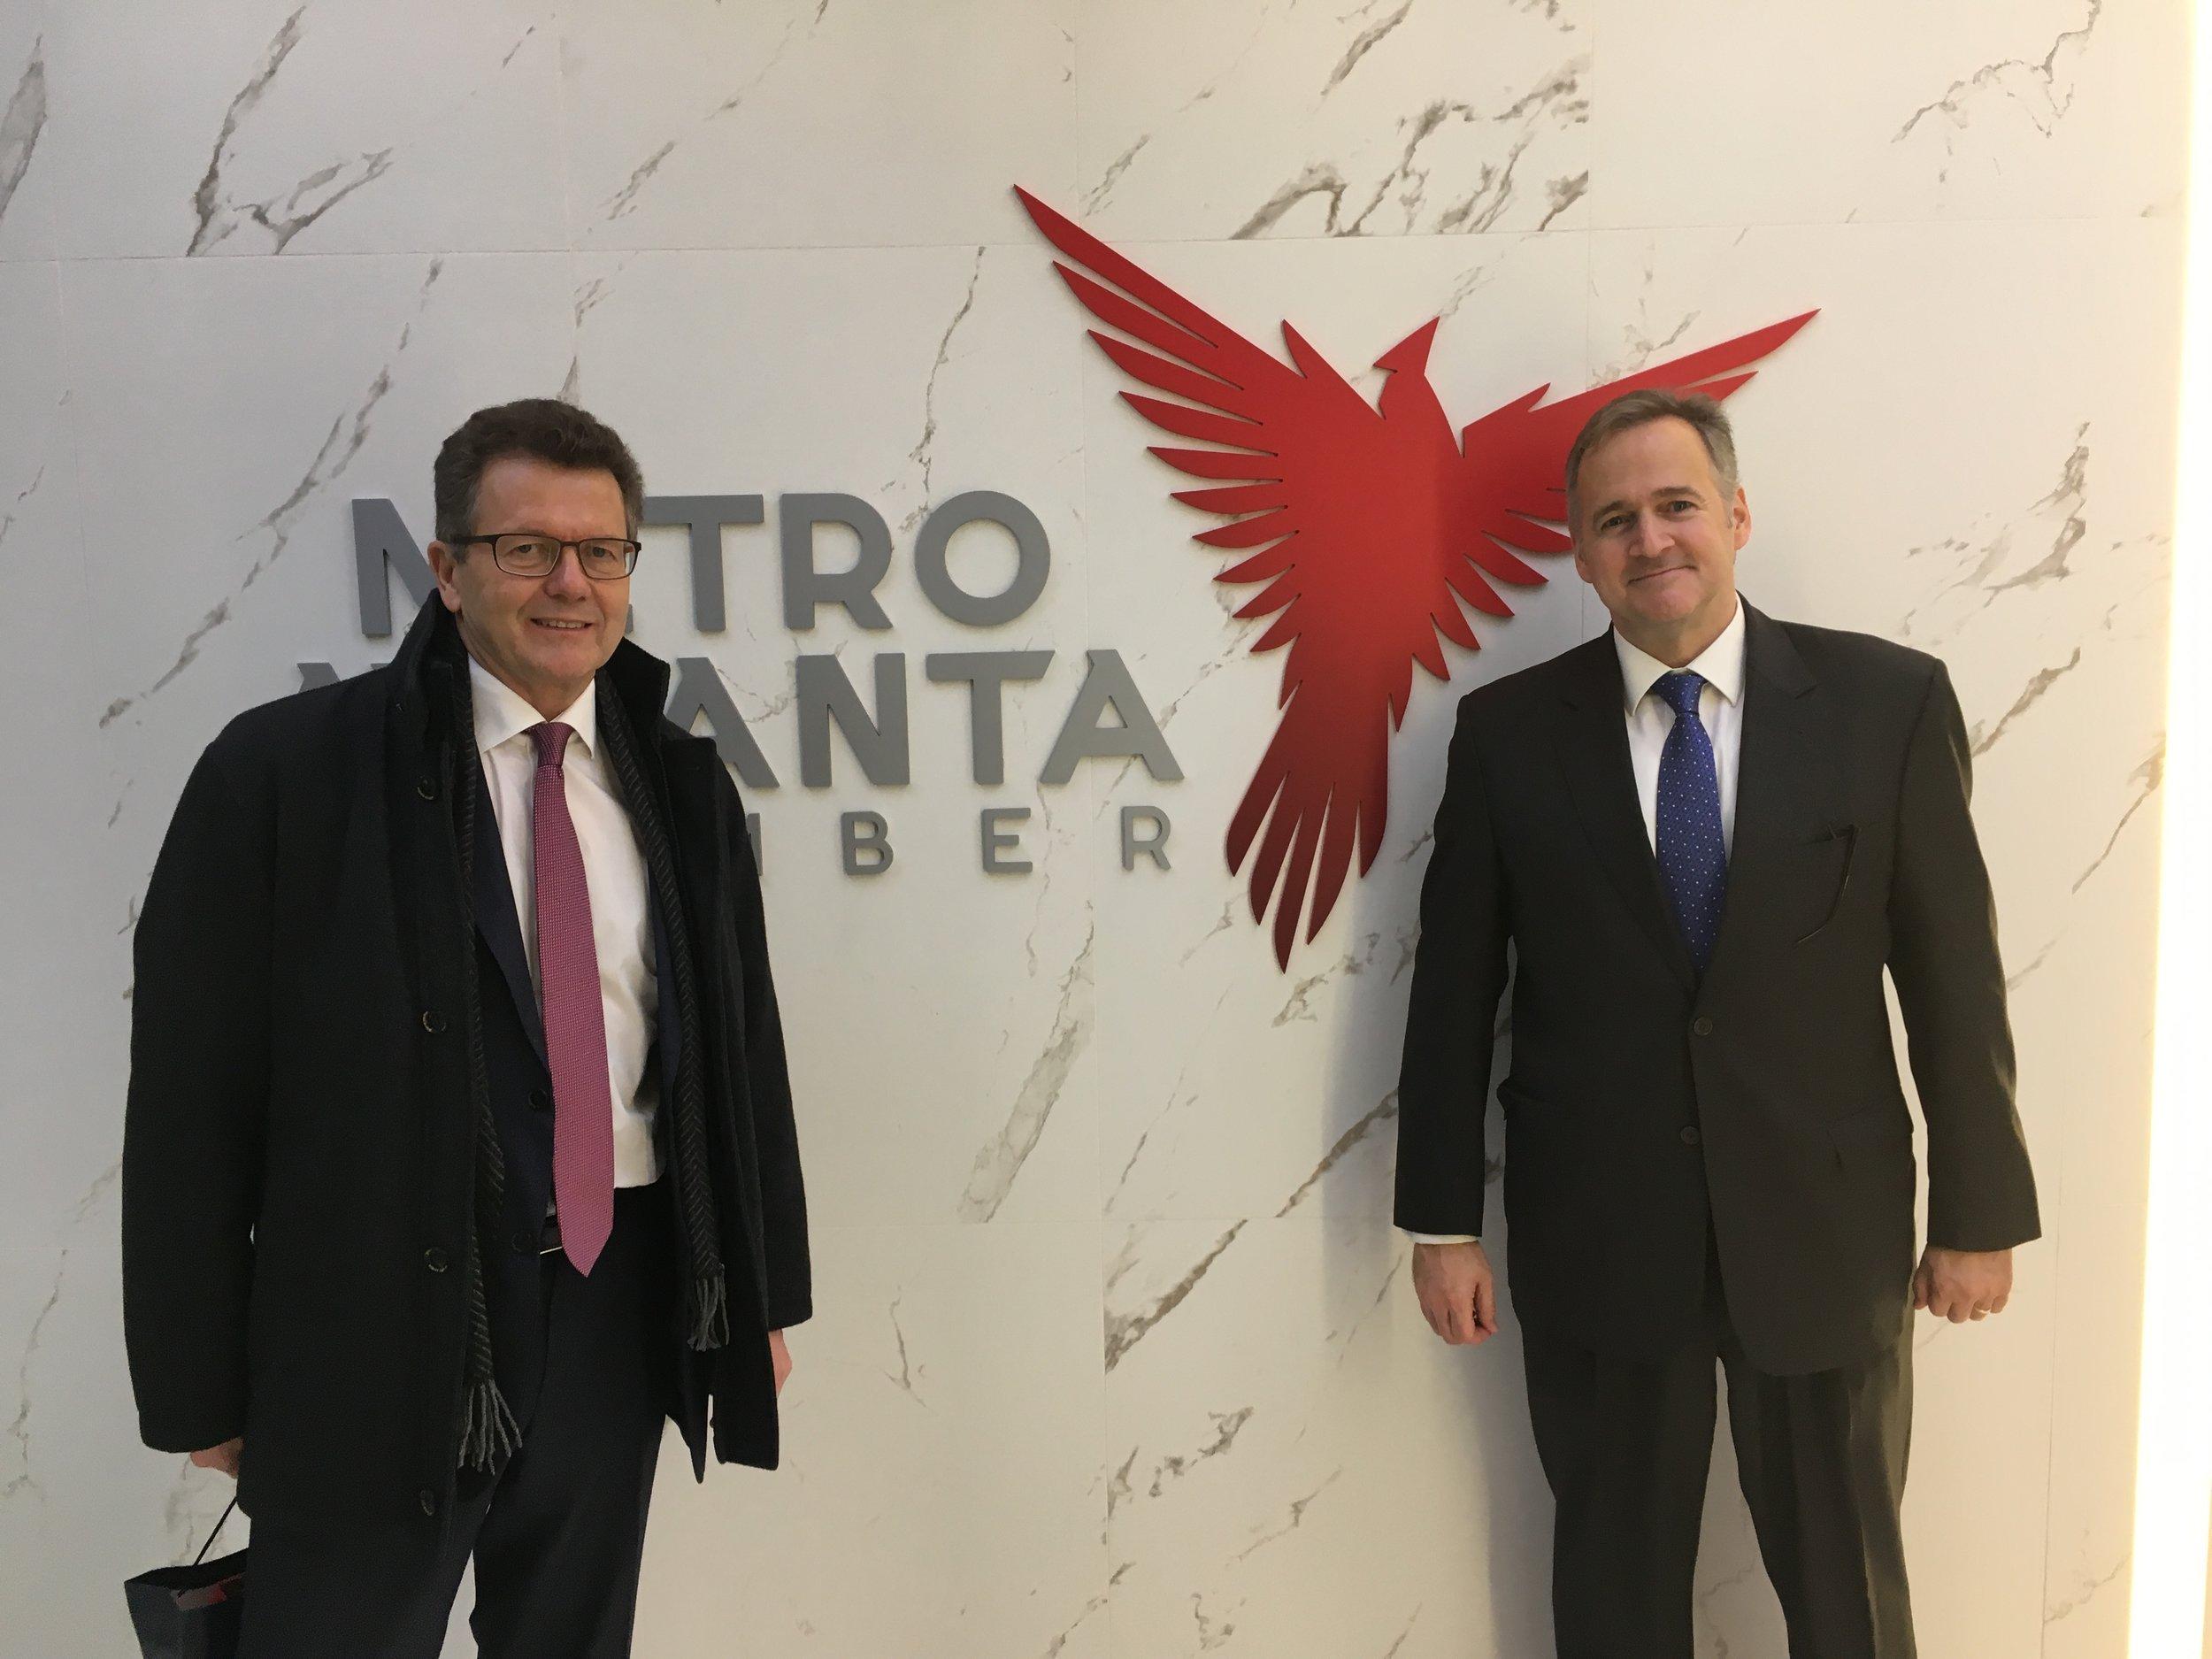 With John Woodward, Senior Director of the Georgia Metro Atlanta Chamber